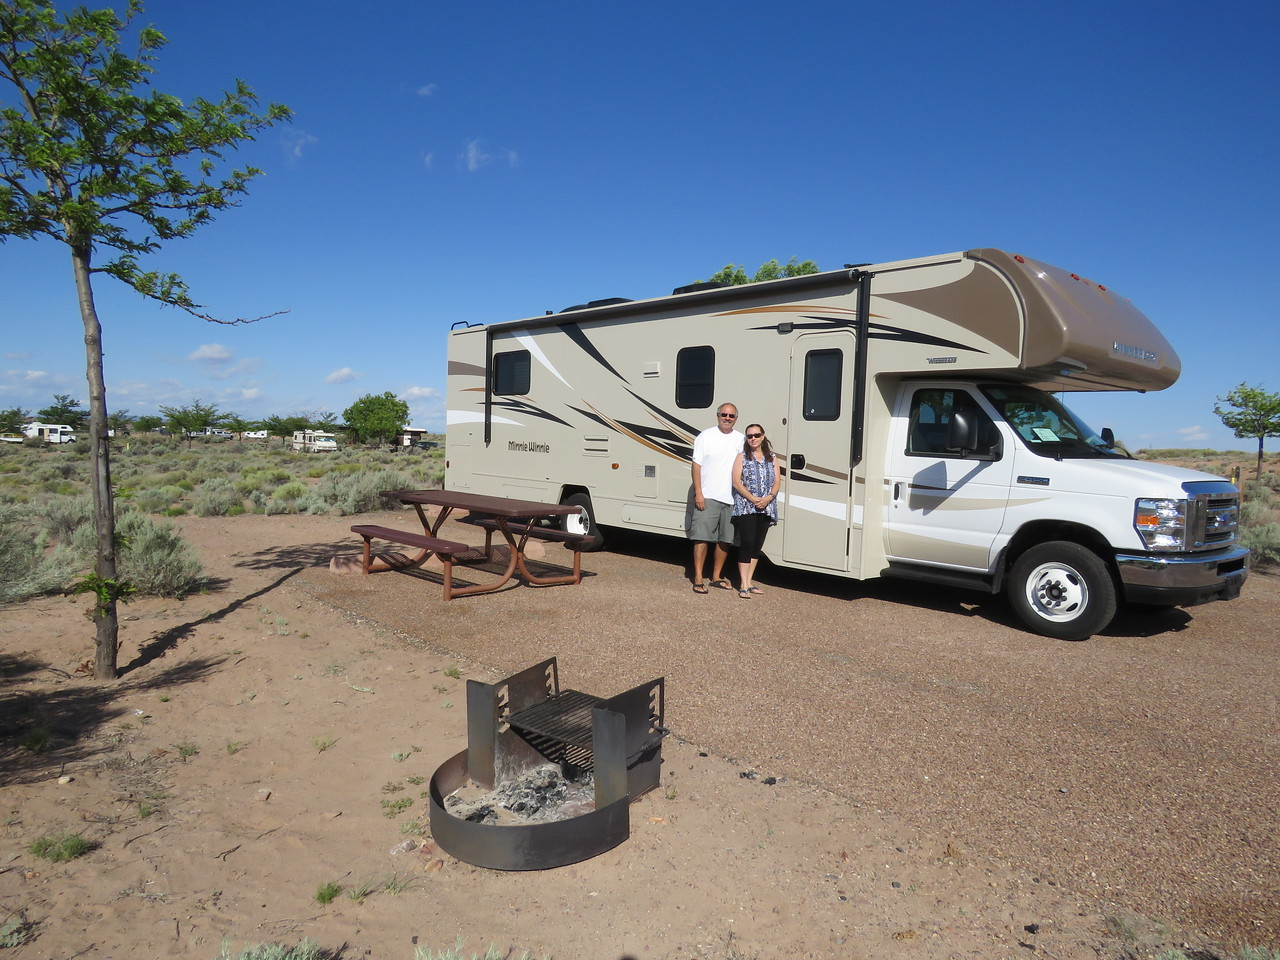 Day 3 - Homolovi State Park, AZ